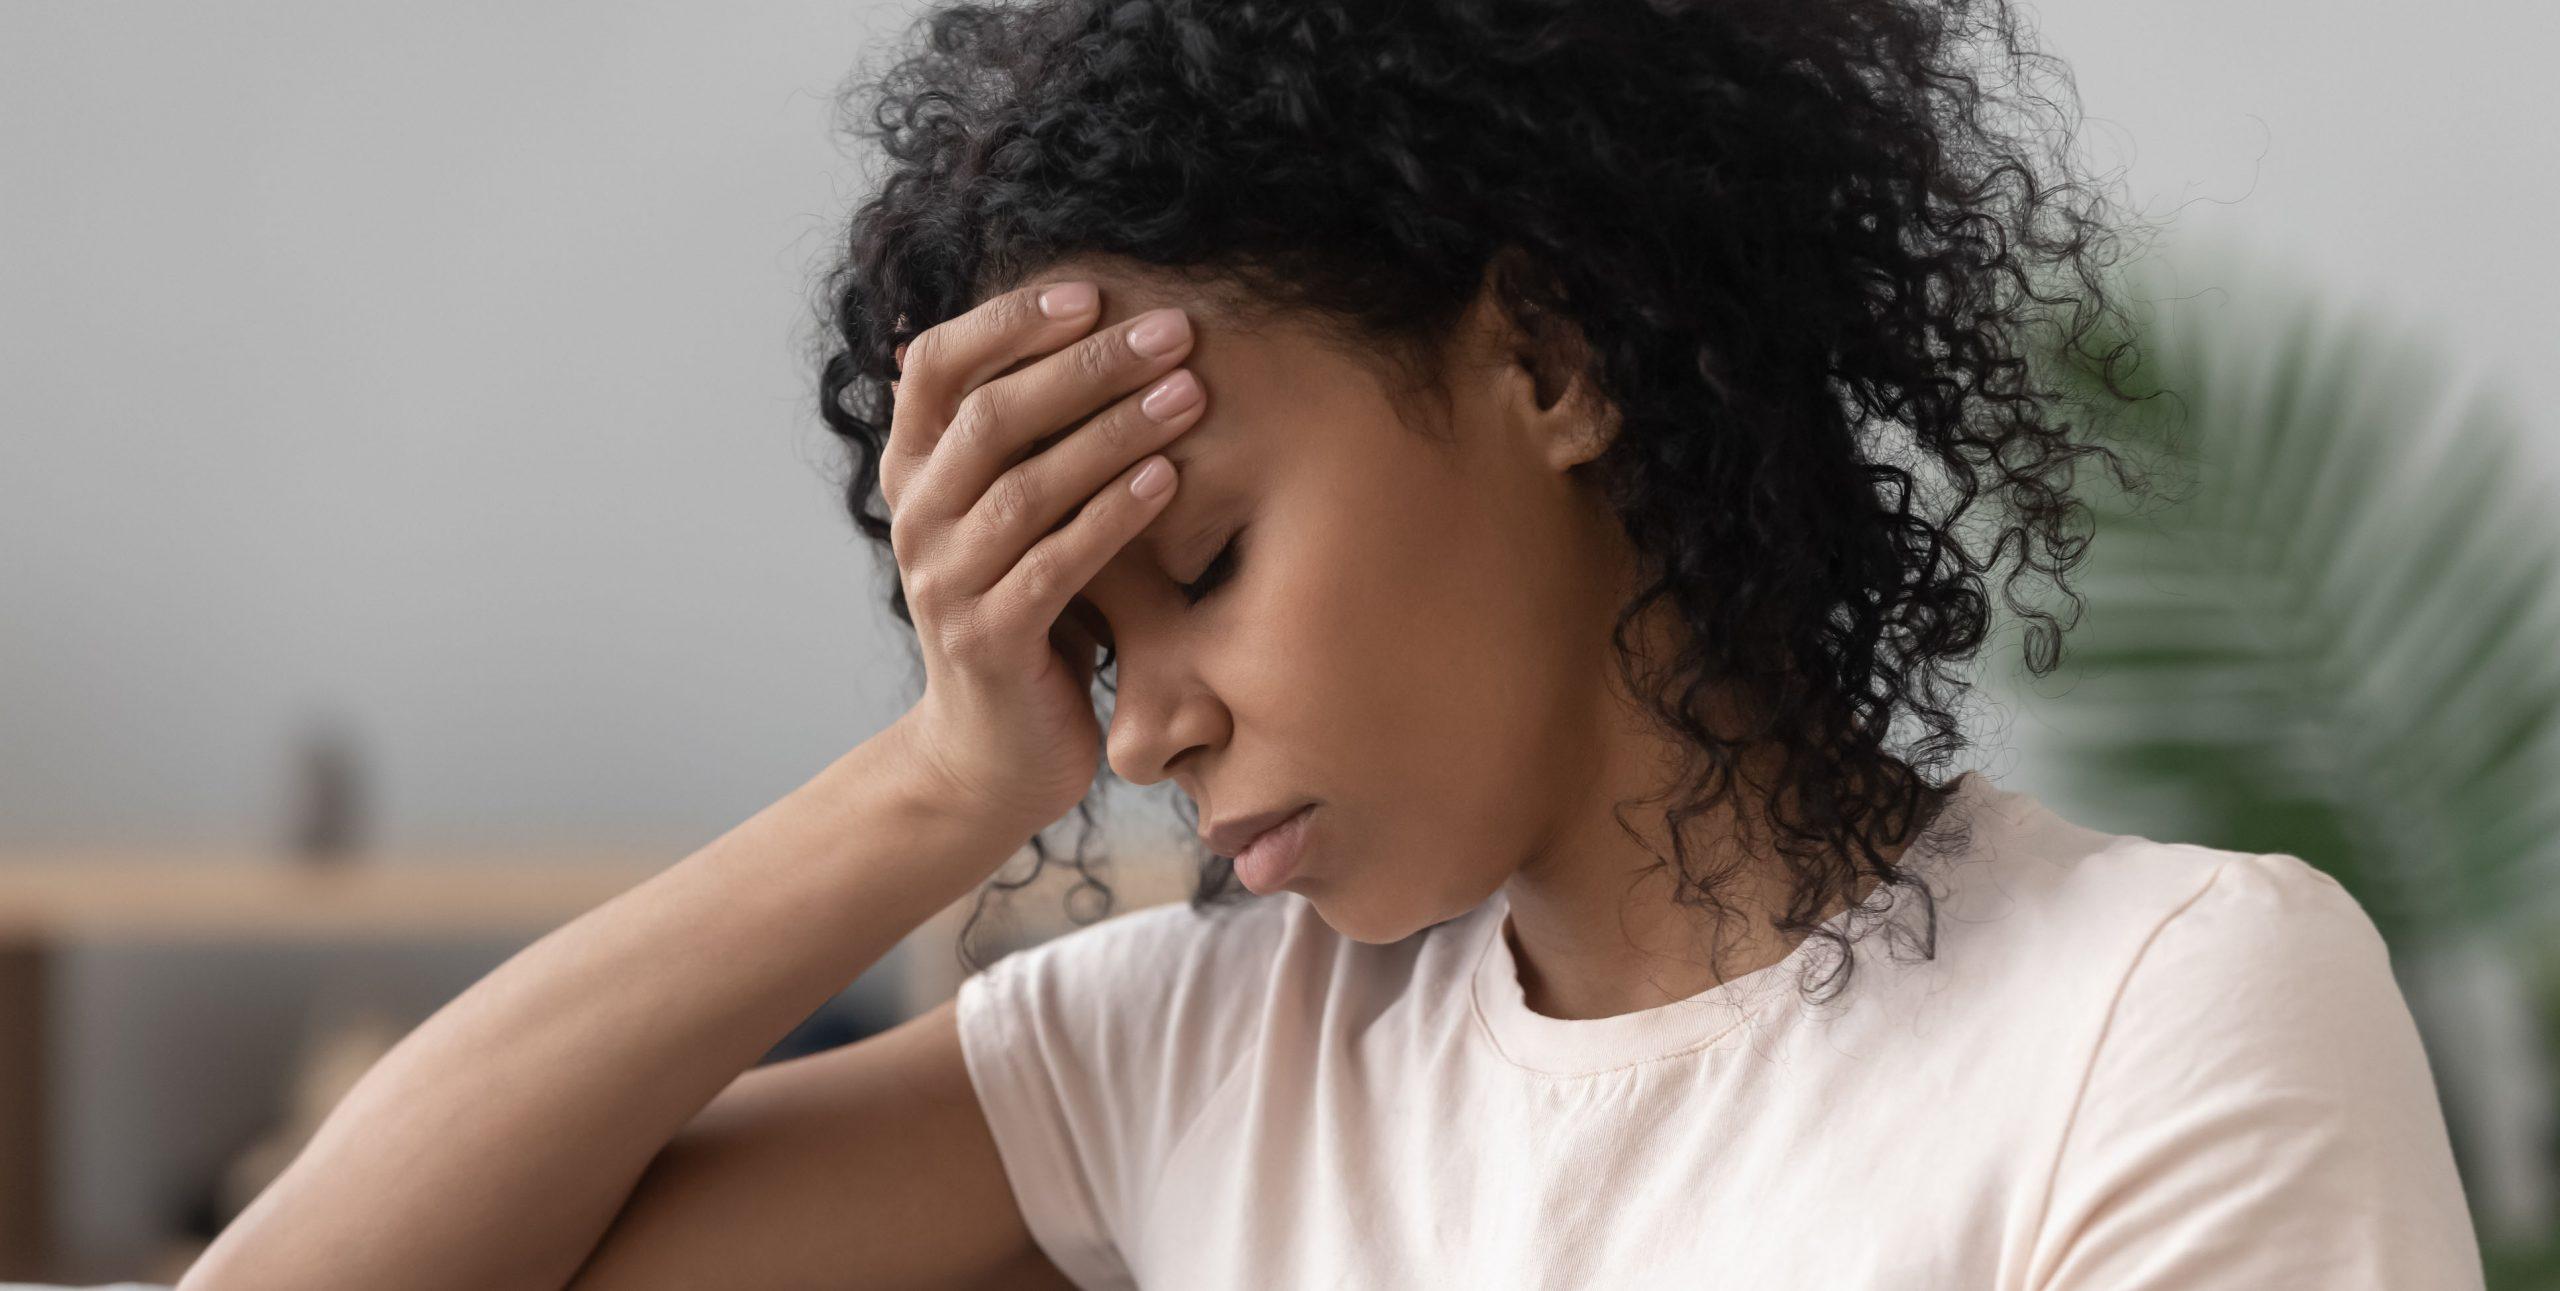 woman with hemicranial headaches